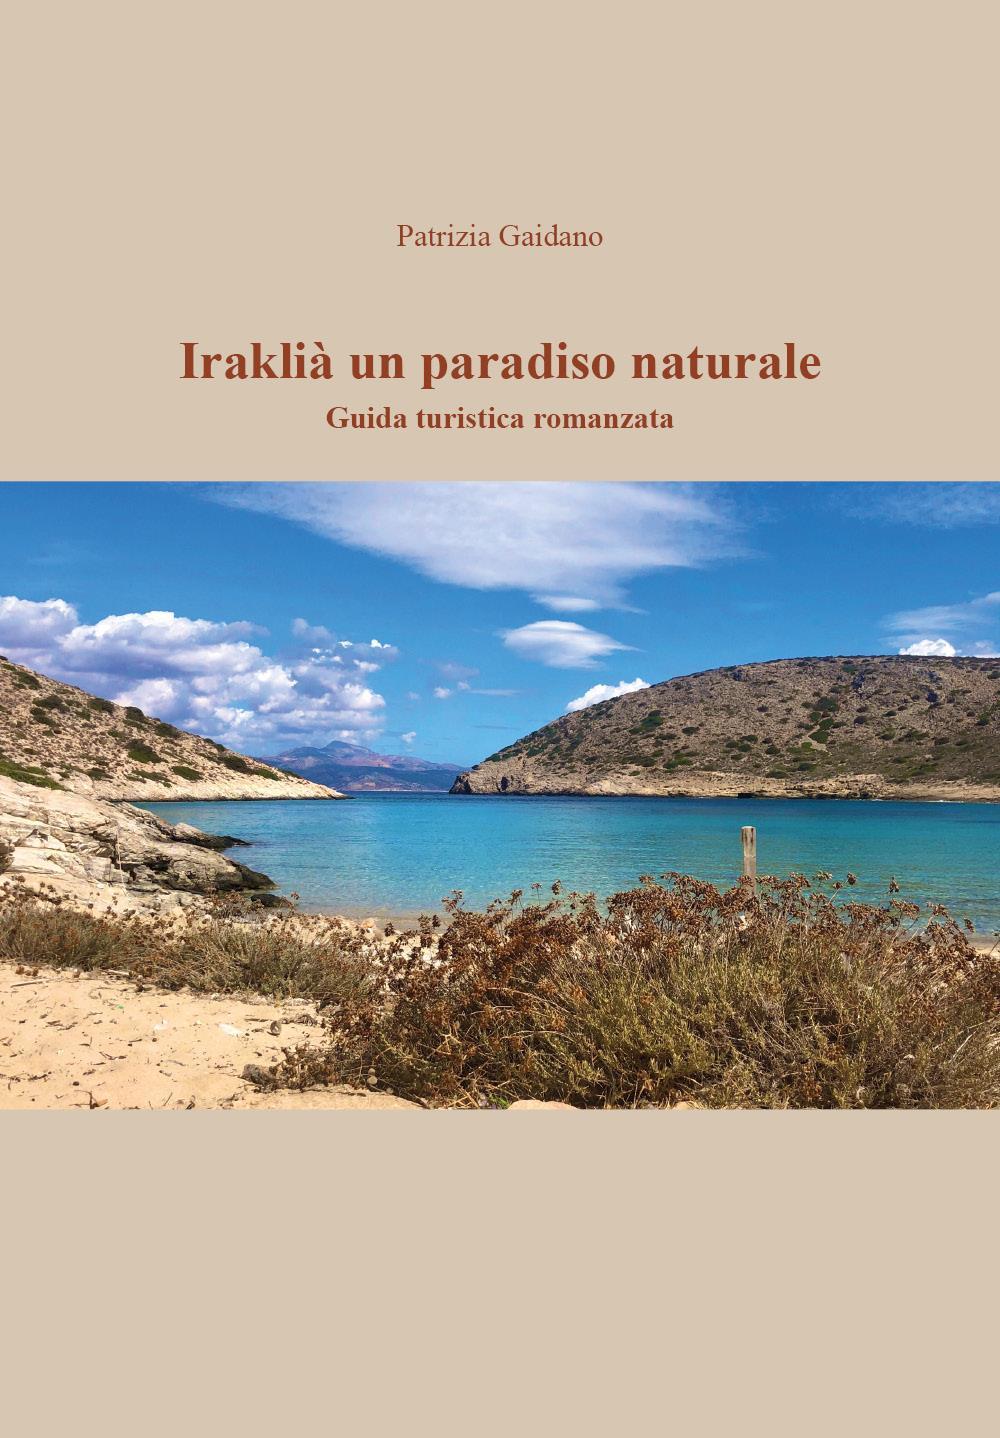 Iraklià, un paradiso naturale